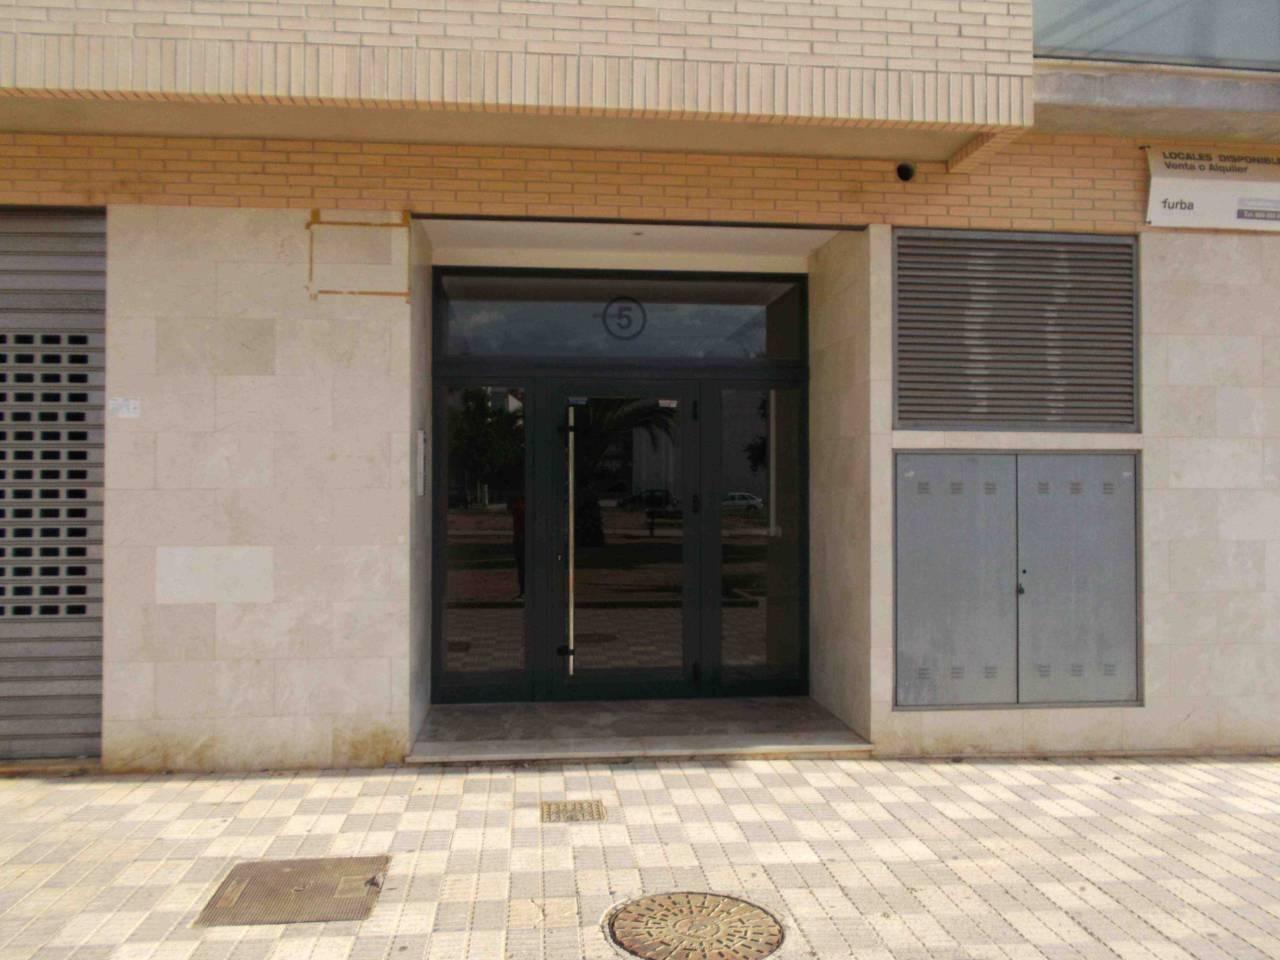 Local Comercial  Alcàsser. Superf. 95 m², 95 m² solar,  1 , tipo de negocio, exterior, esta